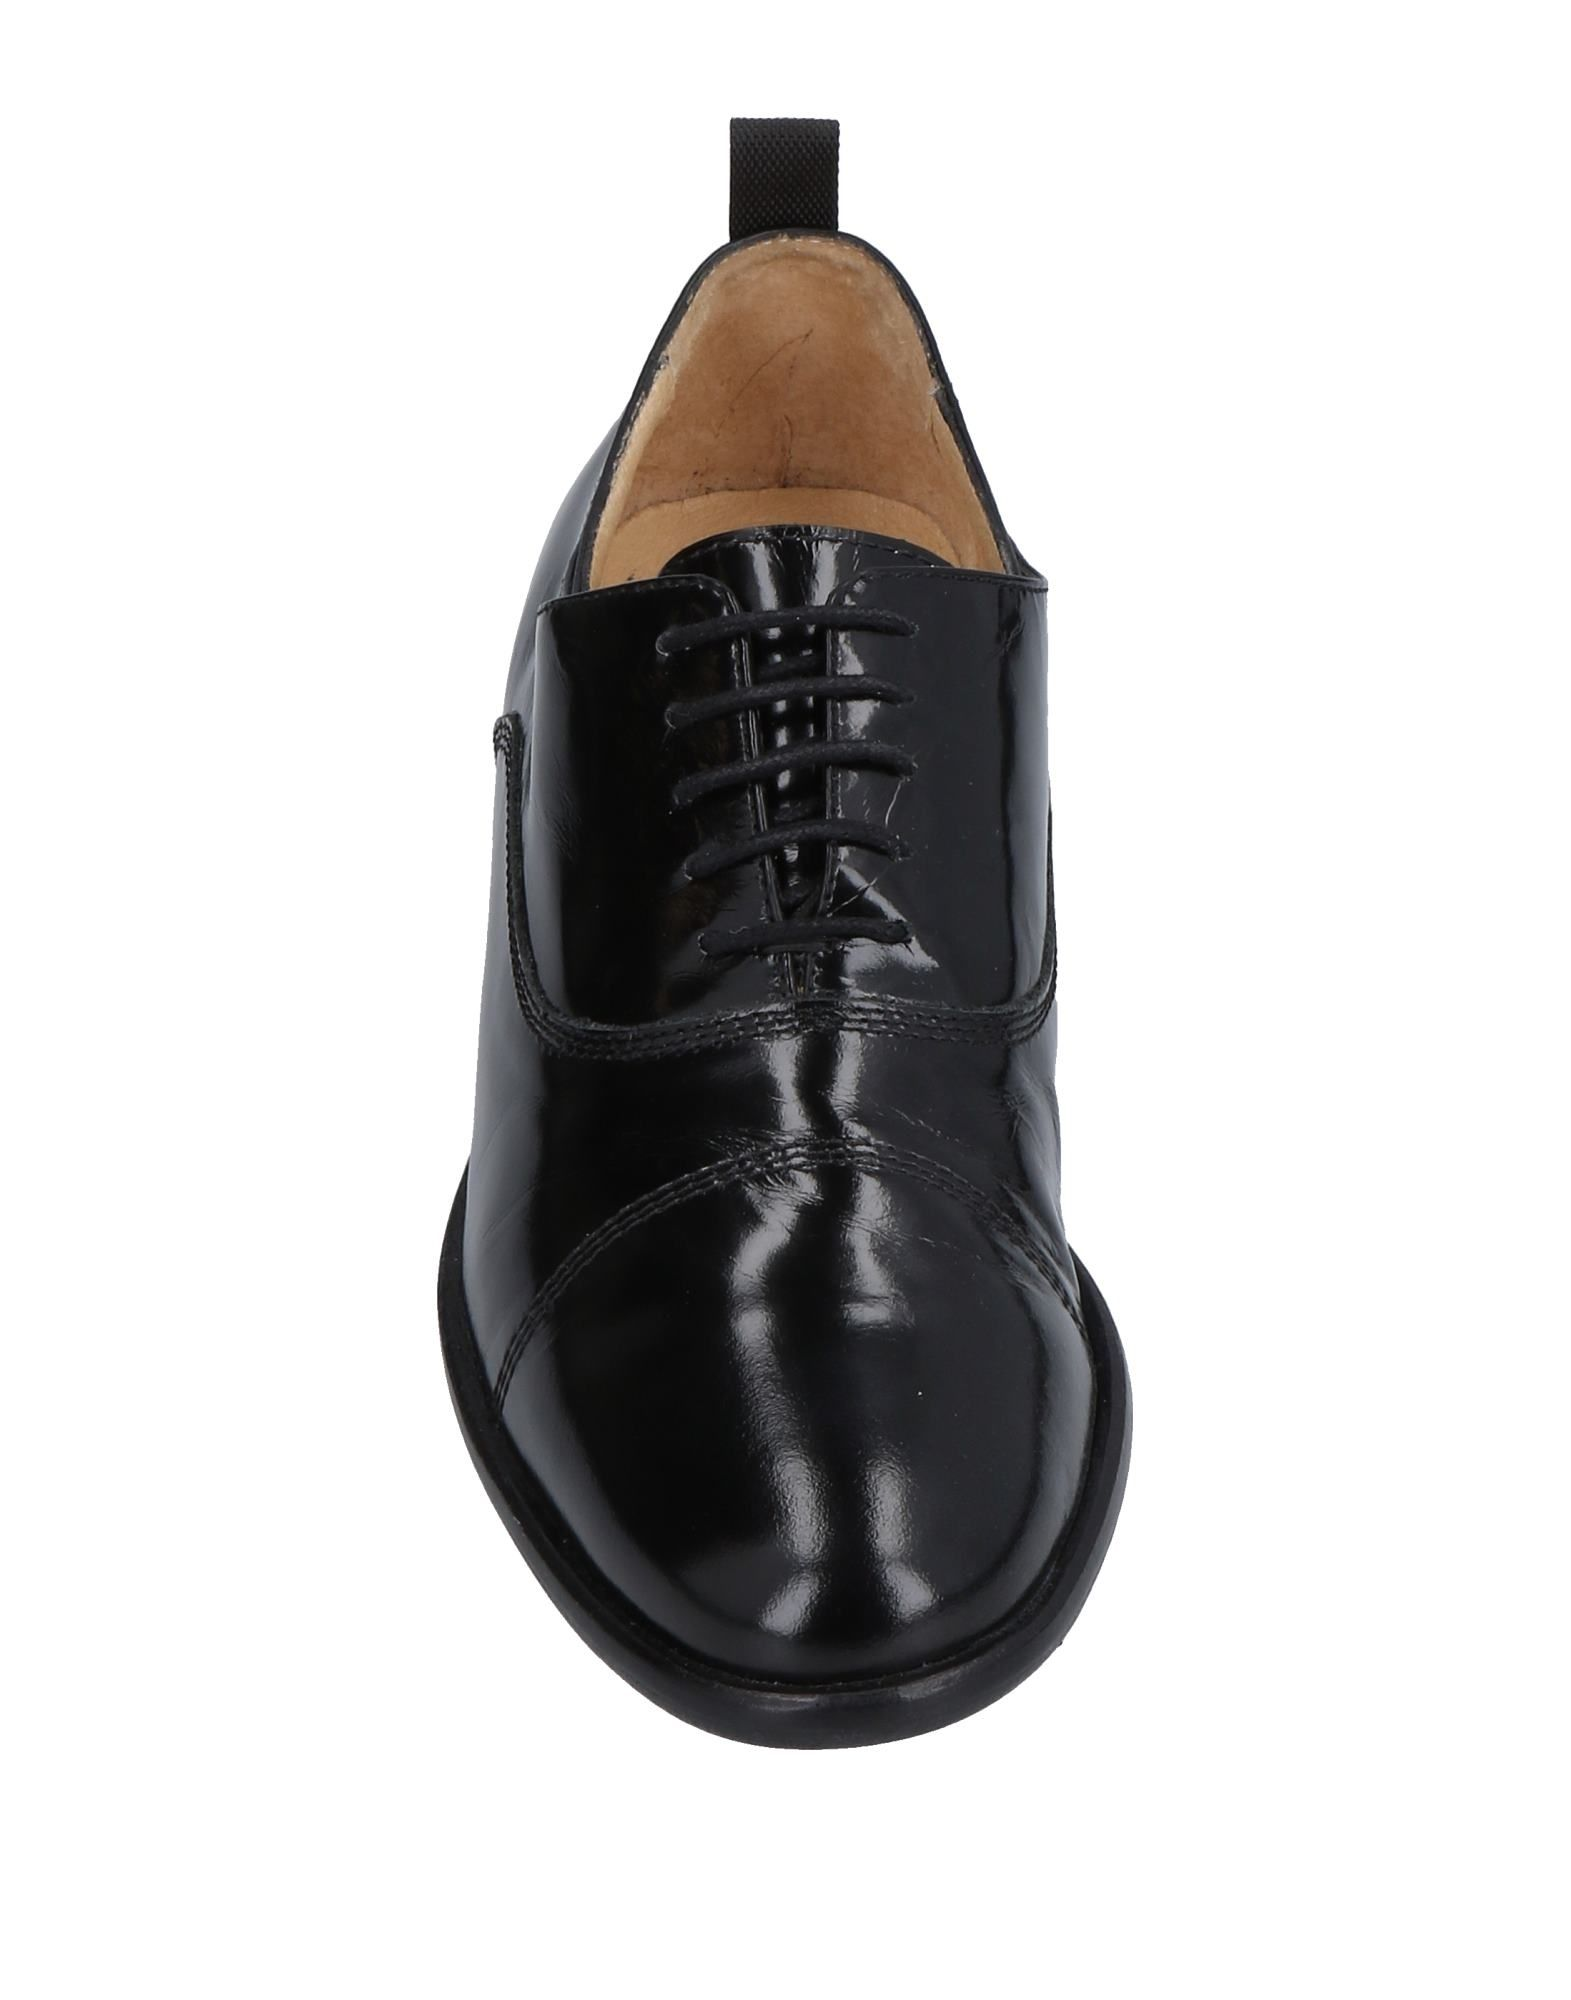 CHAUSSURES - Chaussures à lacetsPoesie Veneziane Umo7Pq7Y2N